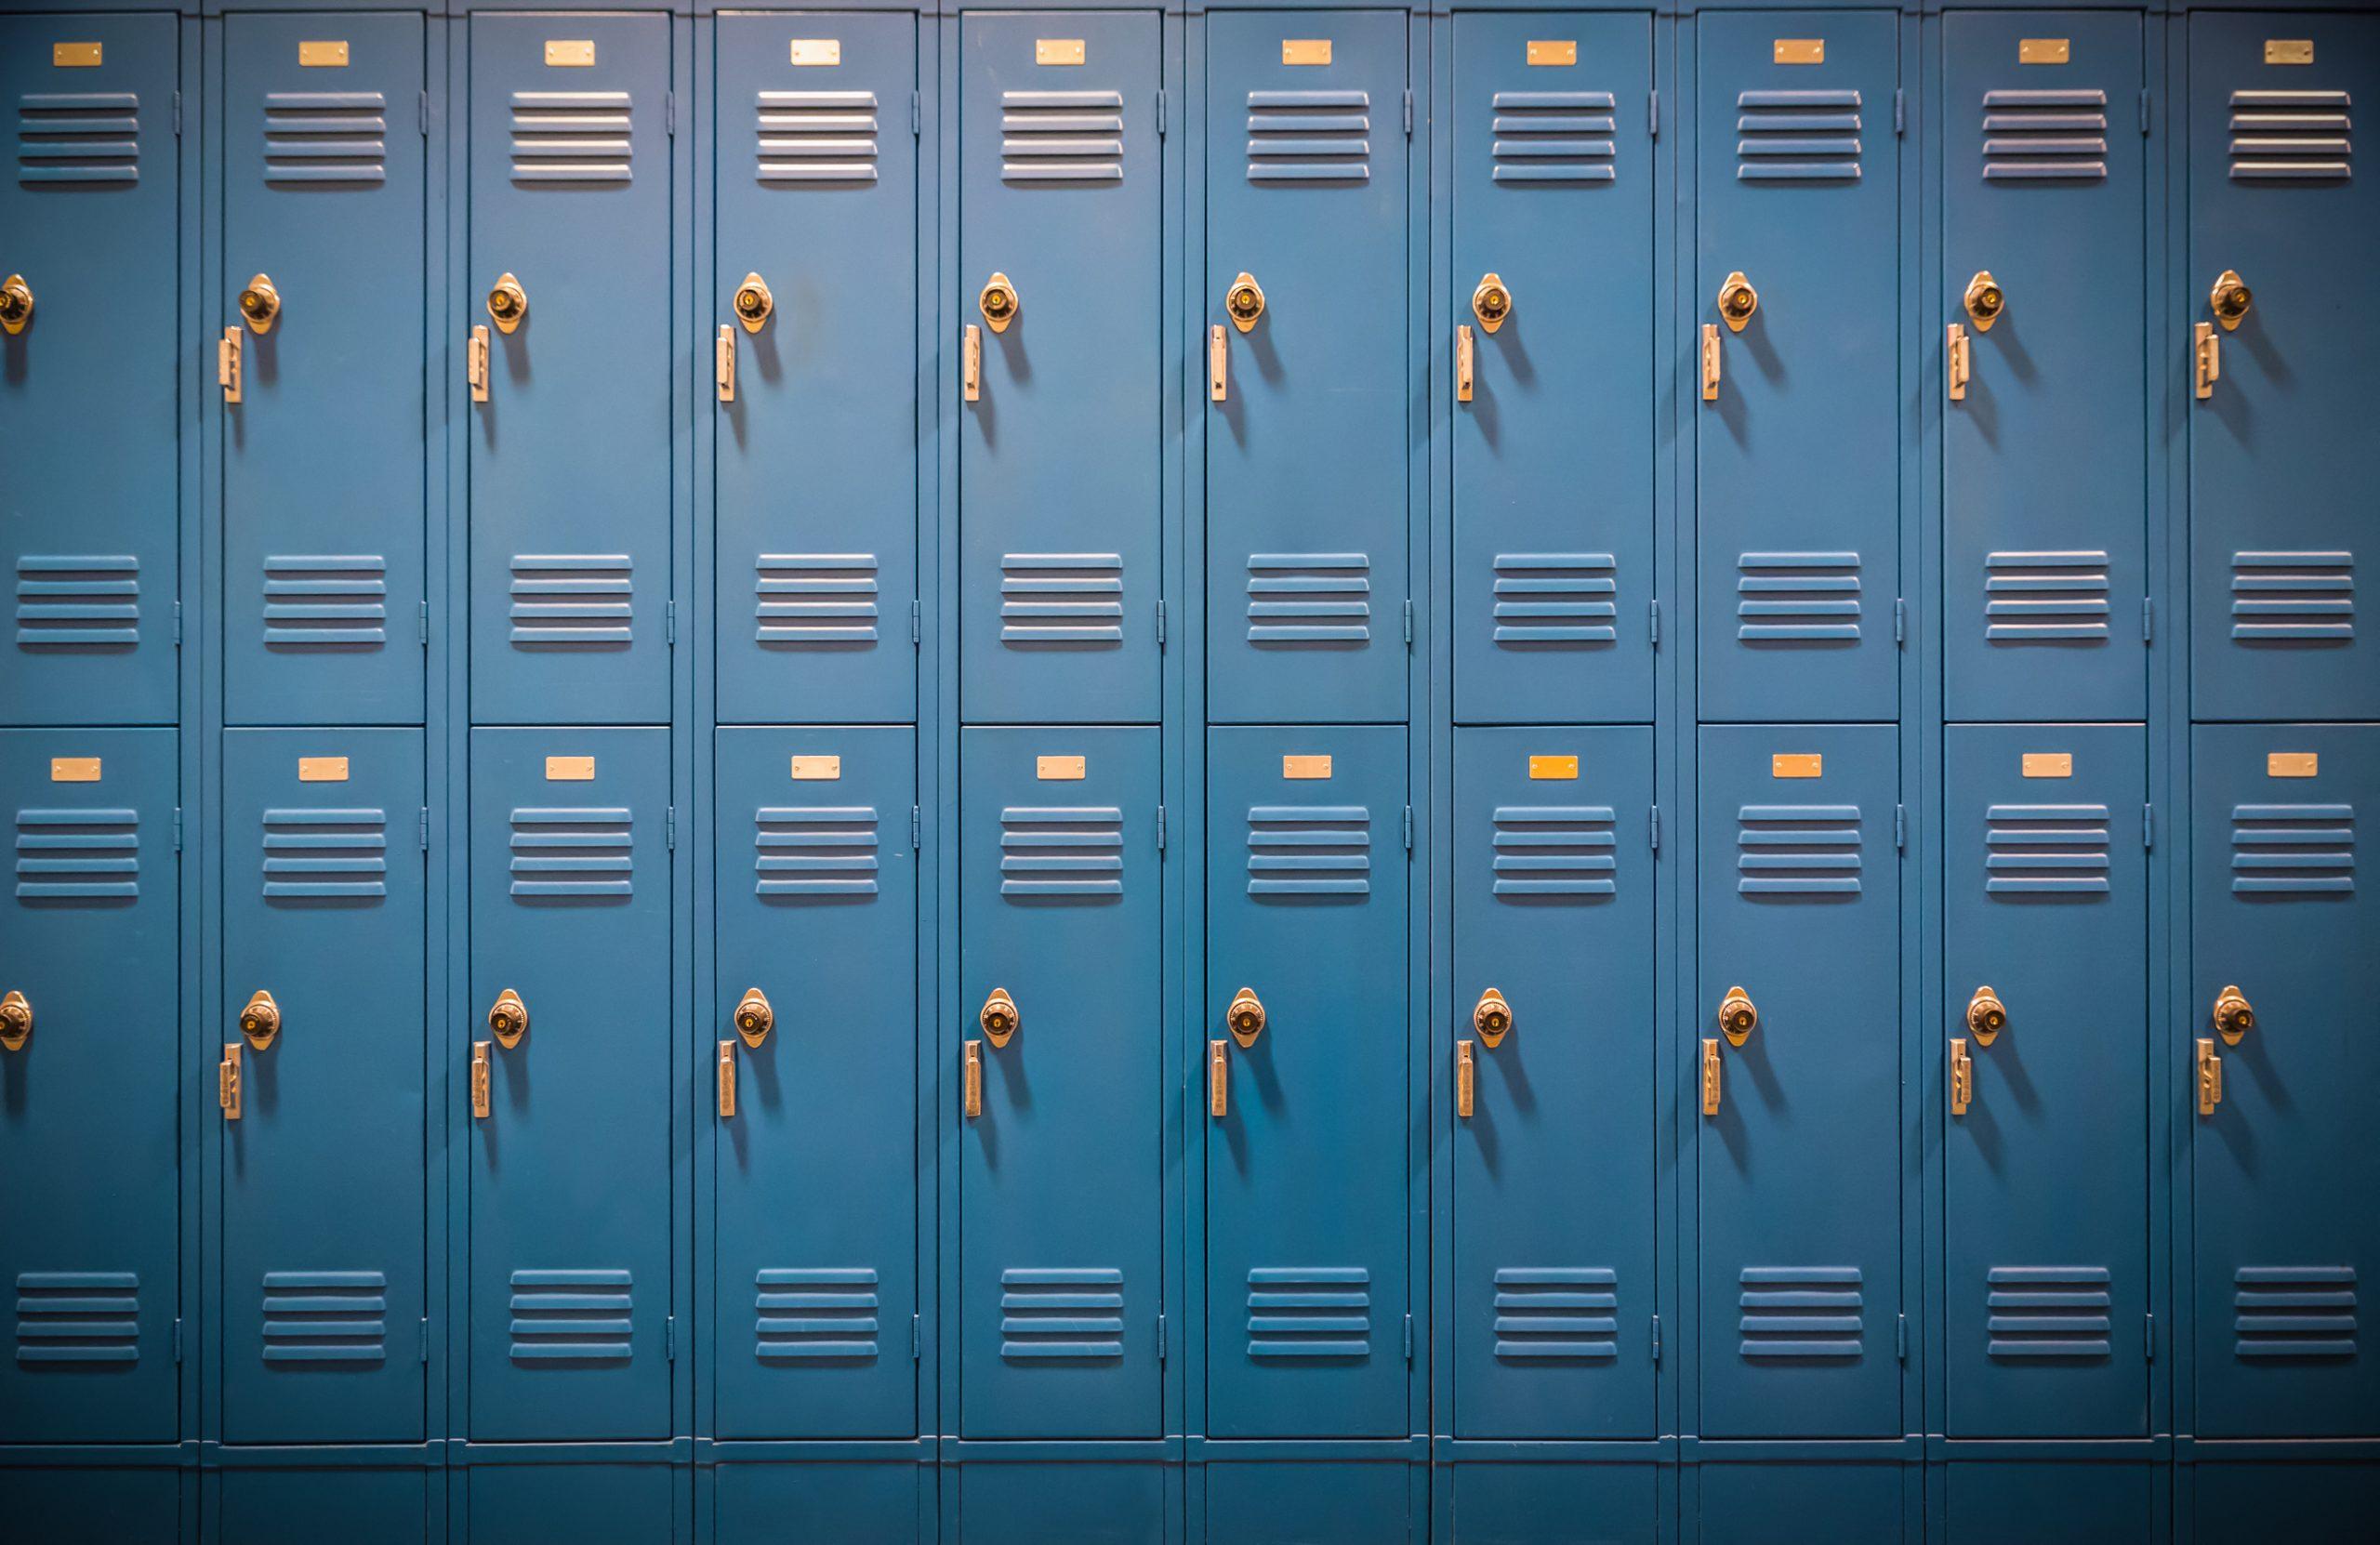 Row of High School Lockers